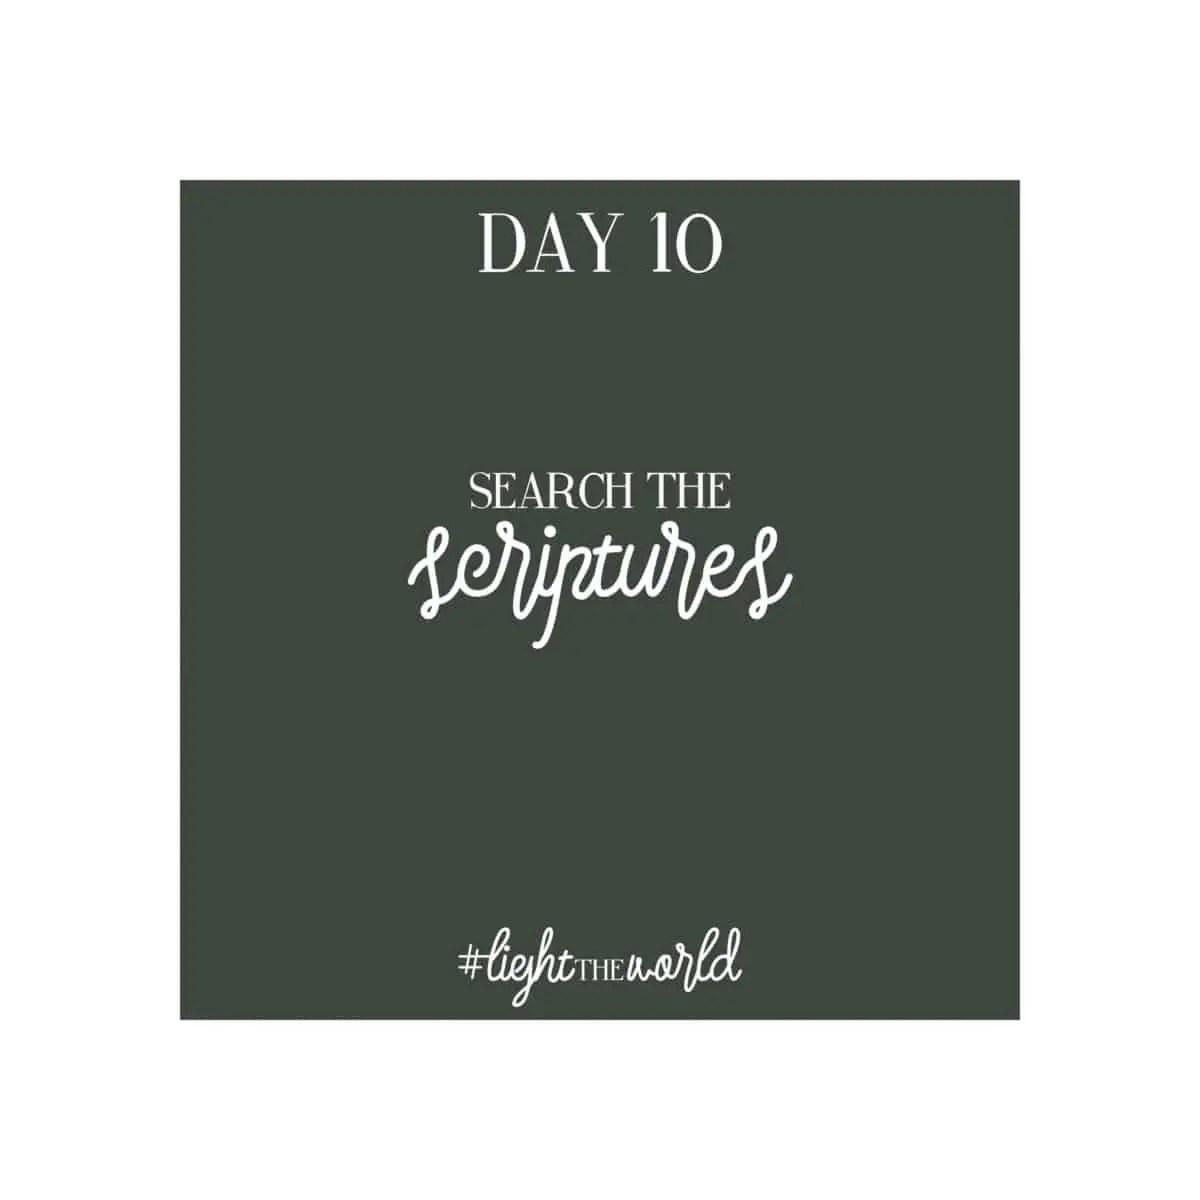 Light the World | Day 10